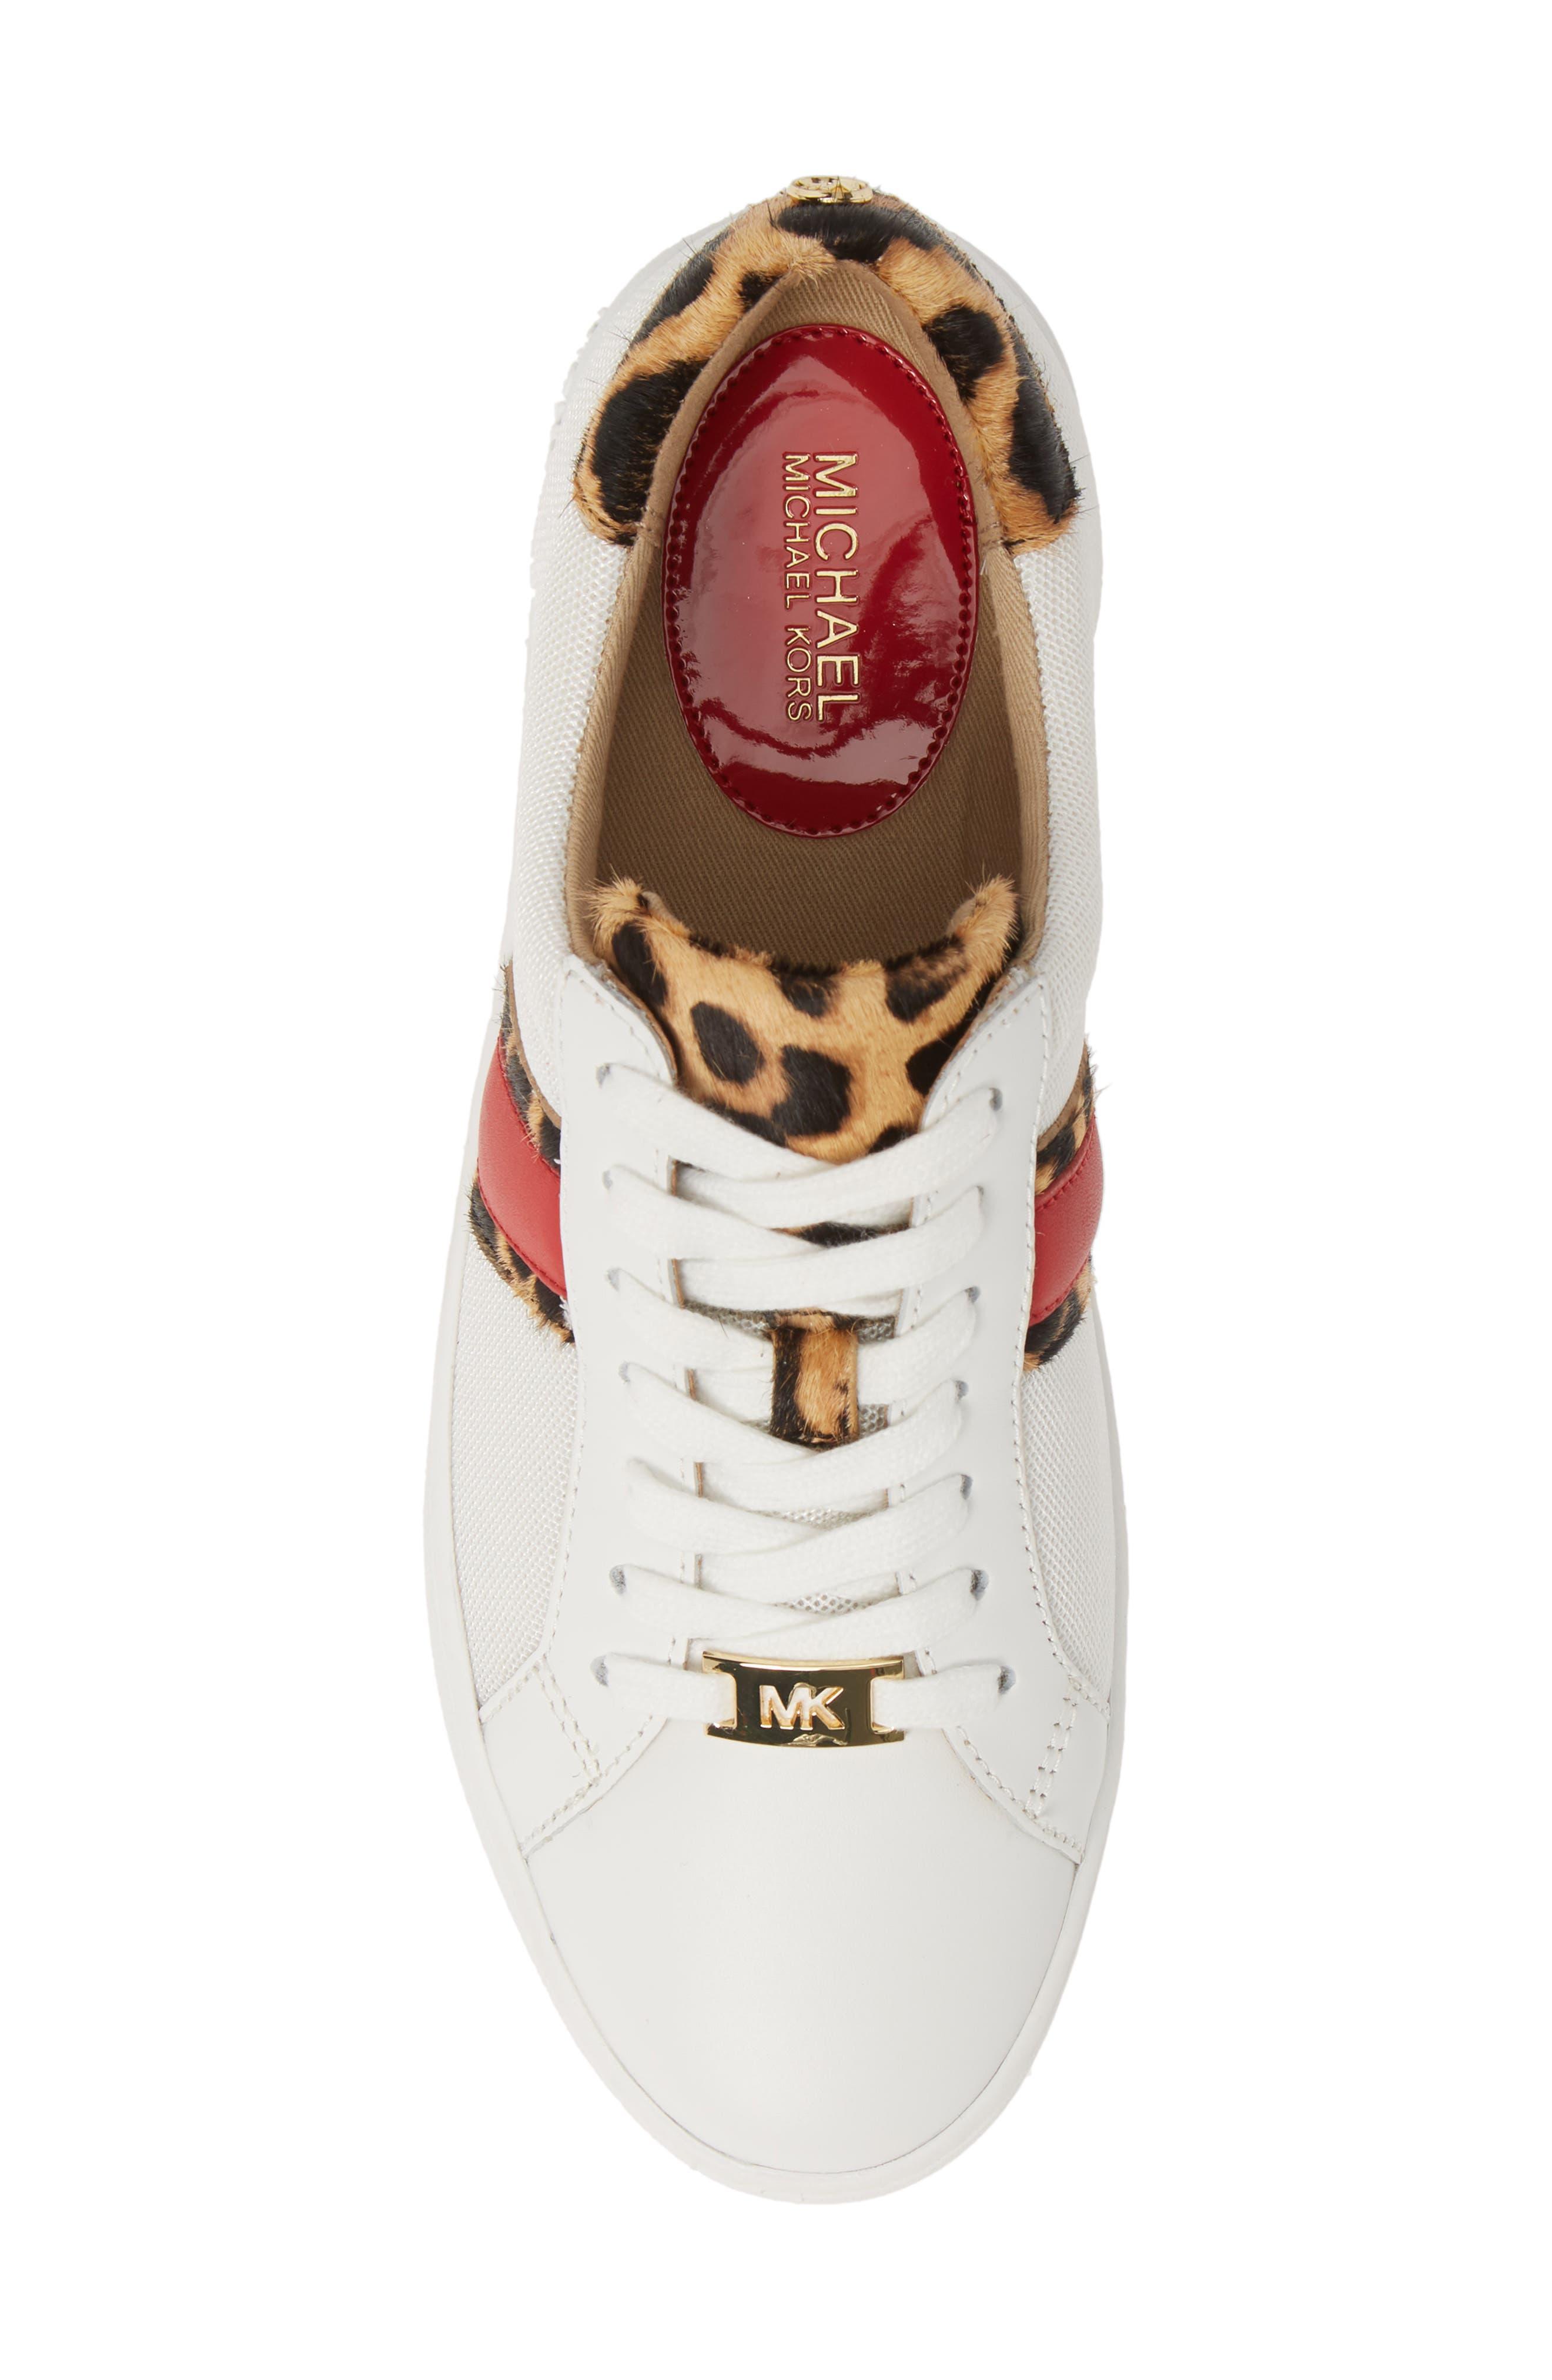 MICHAEL MICHAEL KORS, Irving Stripe Sneaker, Alternate thumbnail 5, color, OPTIC WHITE/ NATURAL